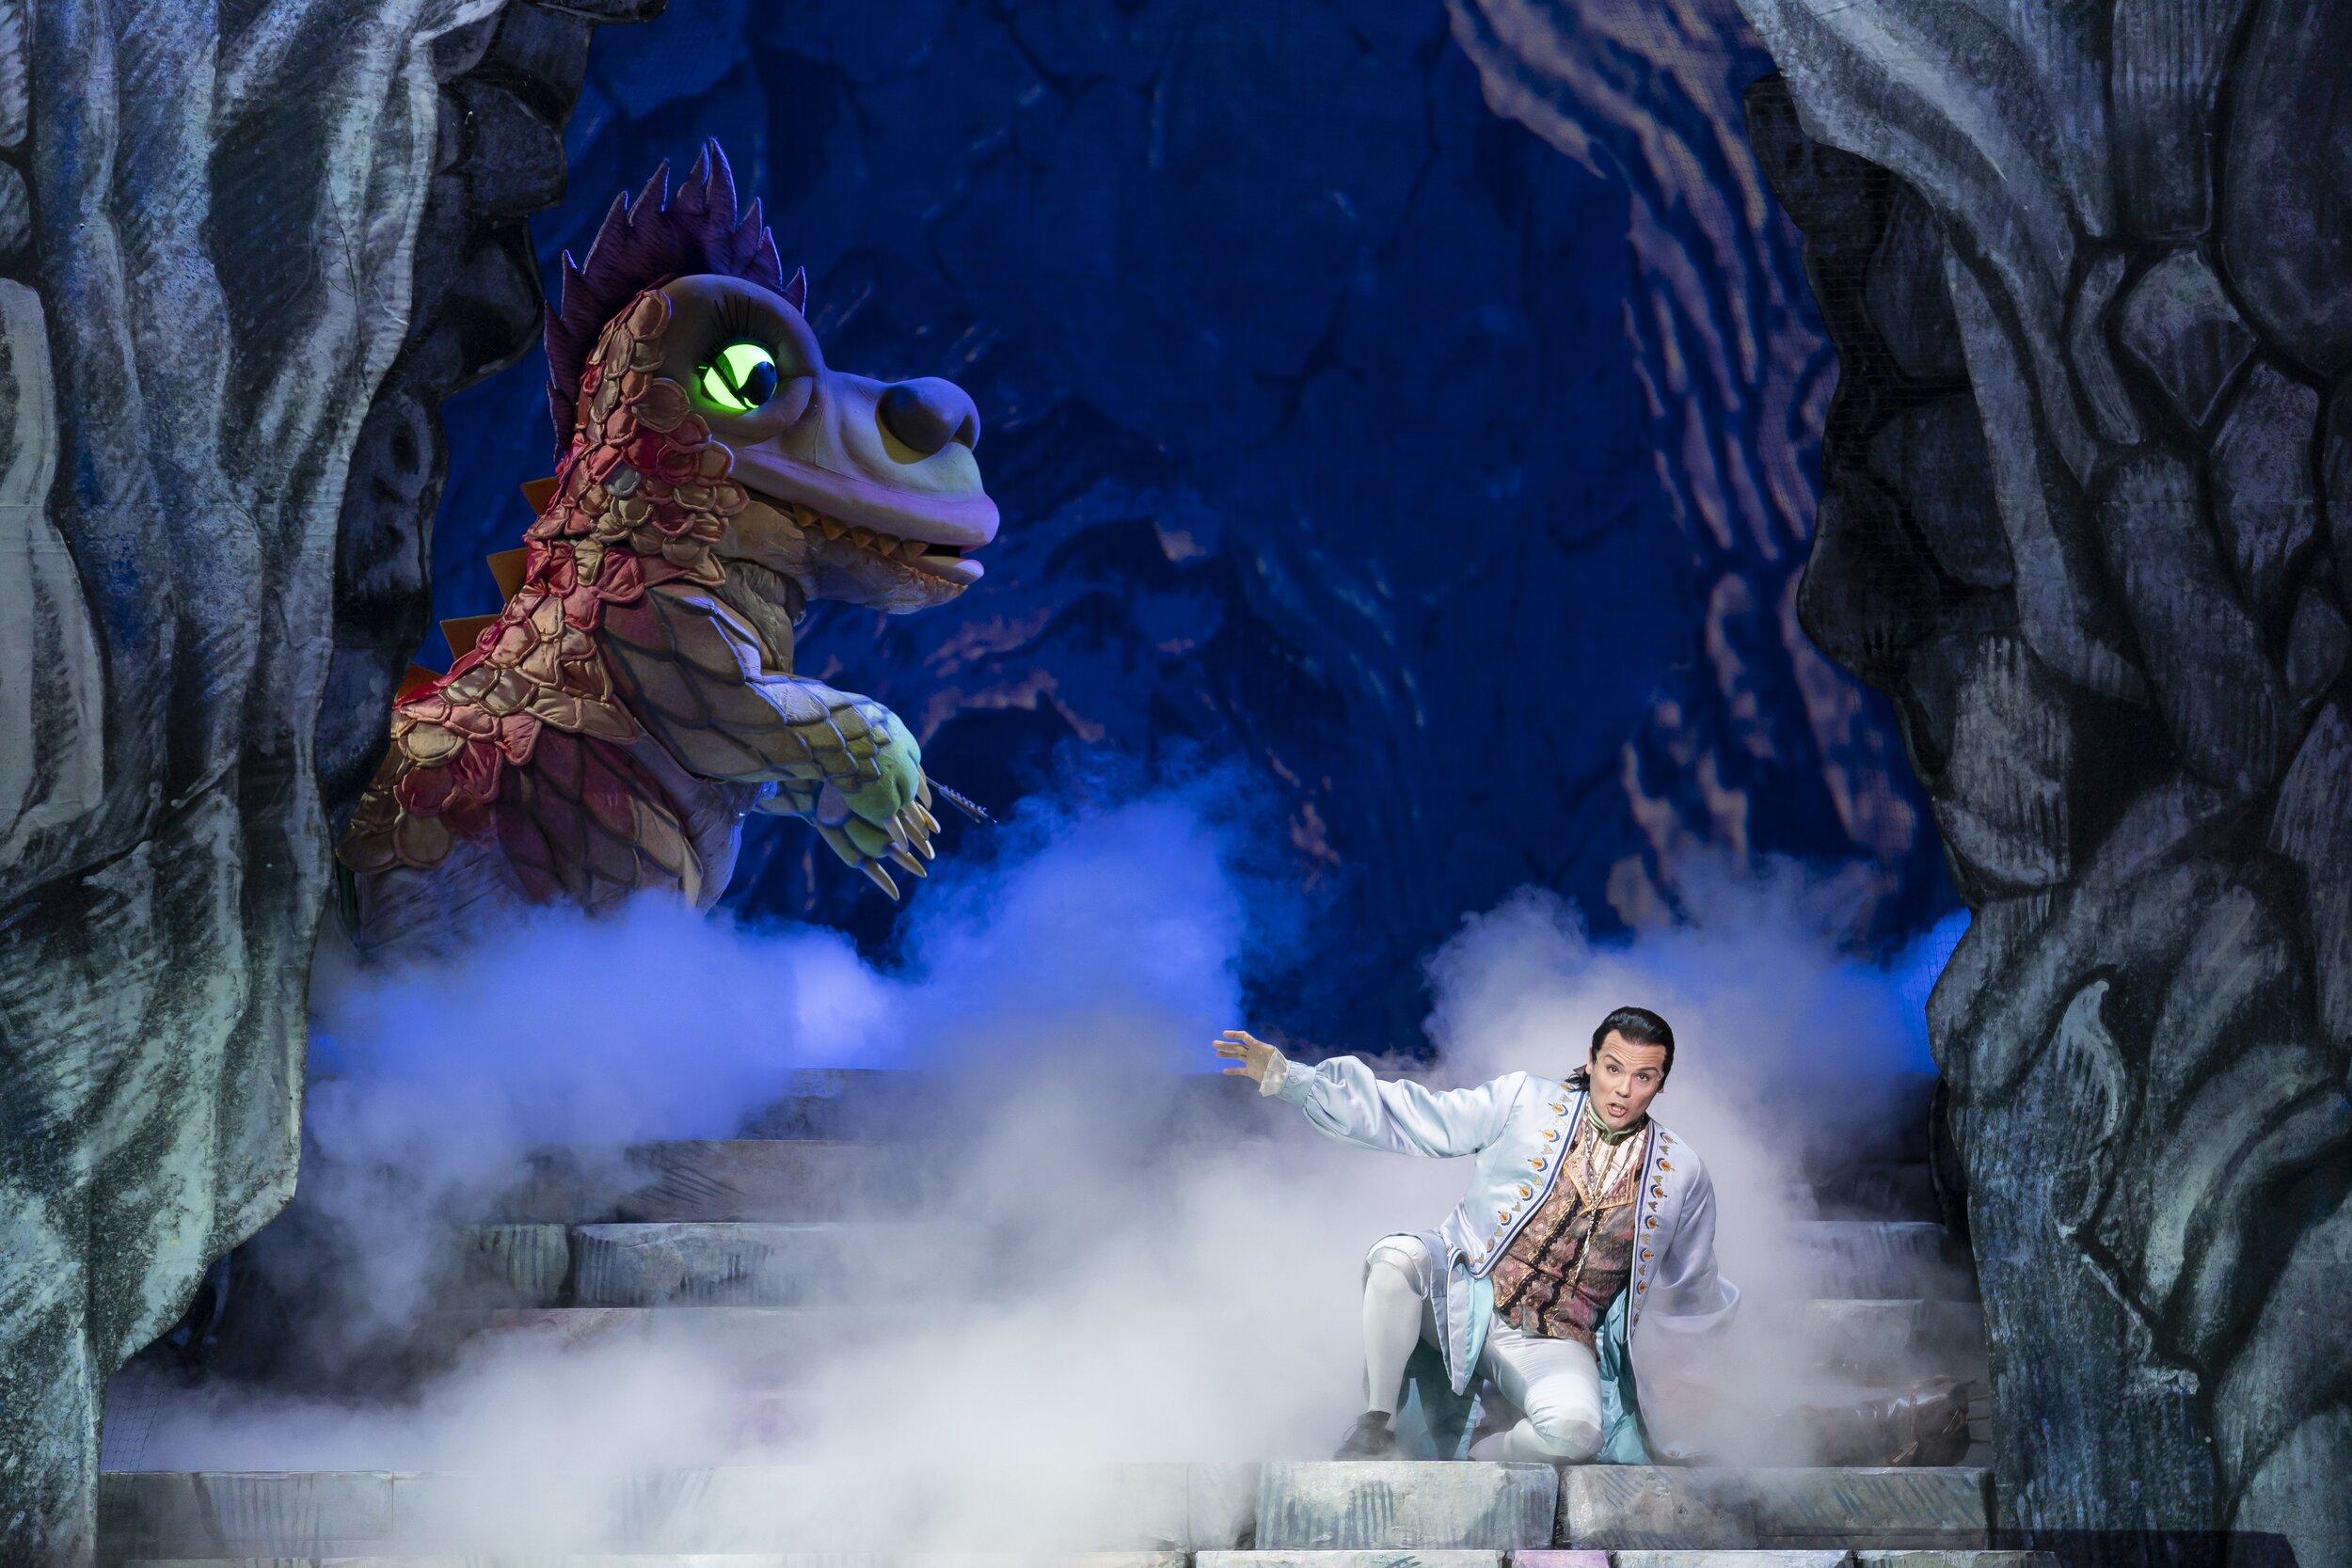 David Portillo in the role of Tamino. Photo by Scott Suchman; courtesy of Washington National Opera.